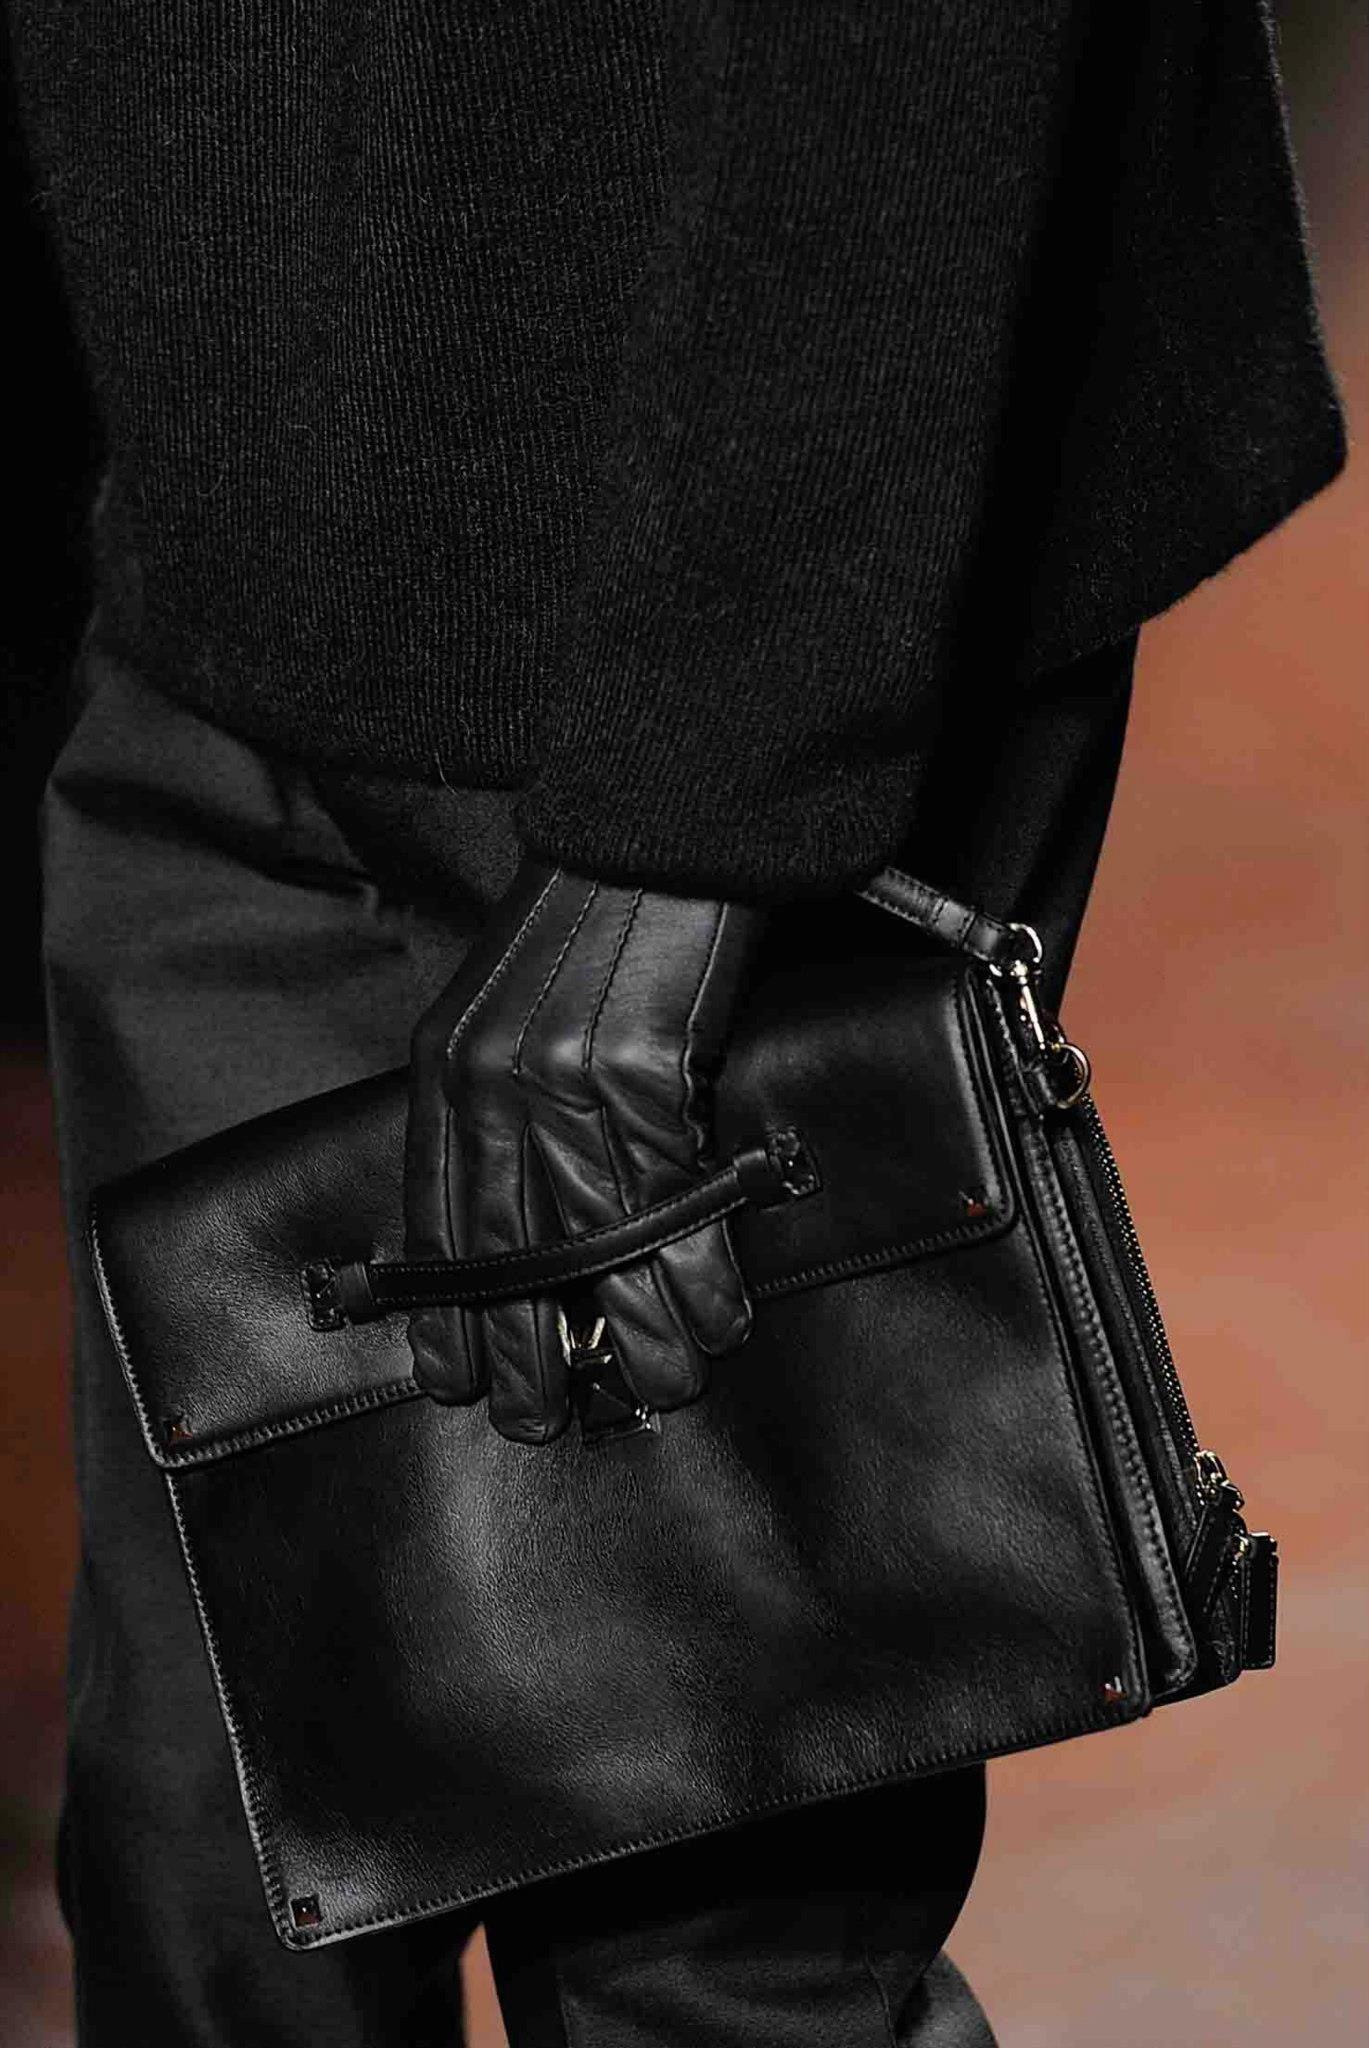 Valentino Men's Bag